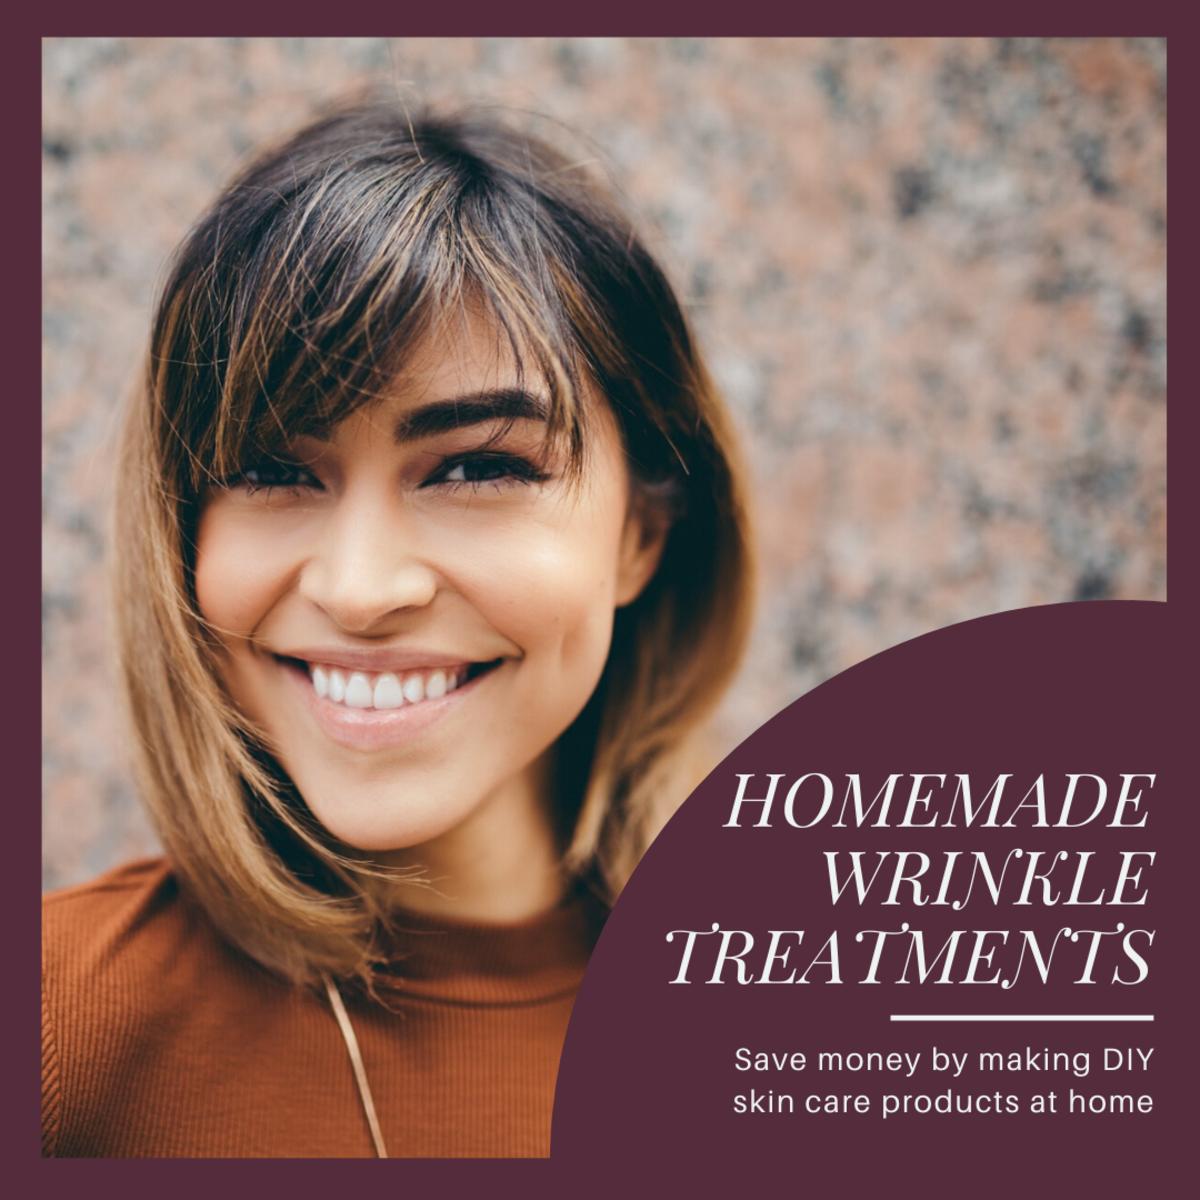 How to Create Homemade Wrinkle Treatments